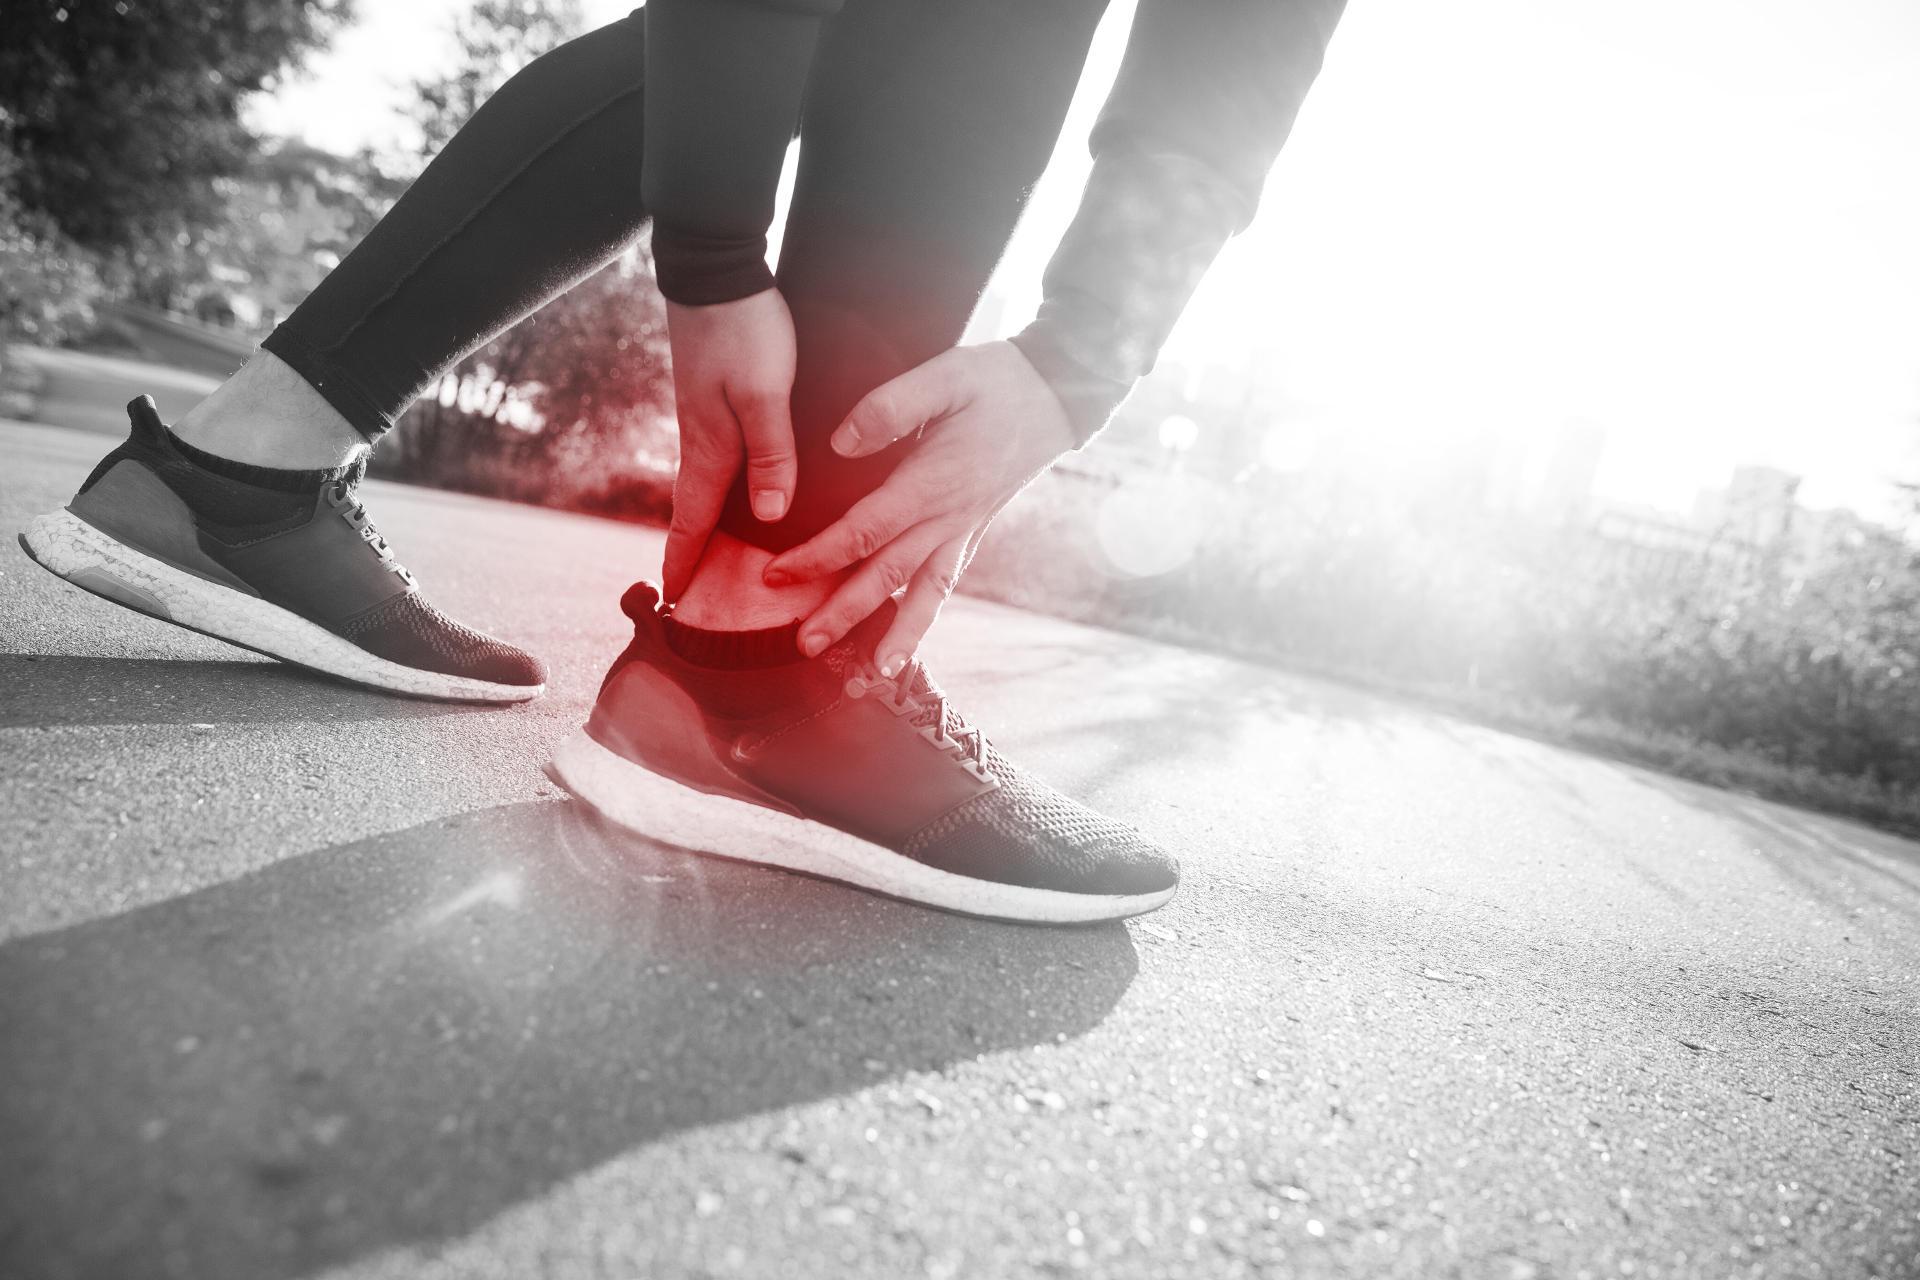 The Frazier Foot & Ankle Center - Dr. Michael J. Frazier image 3